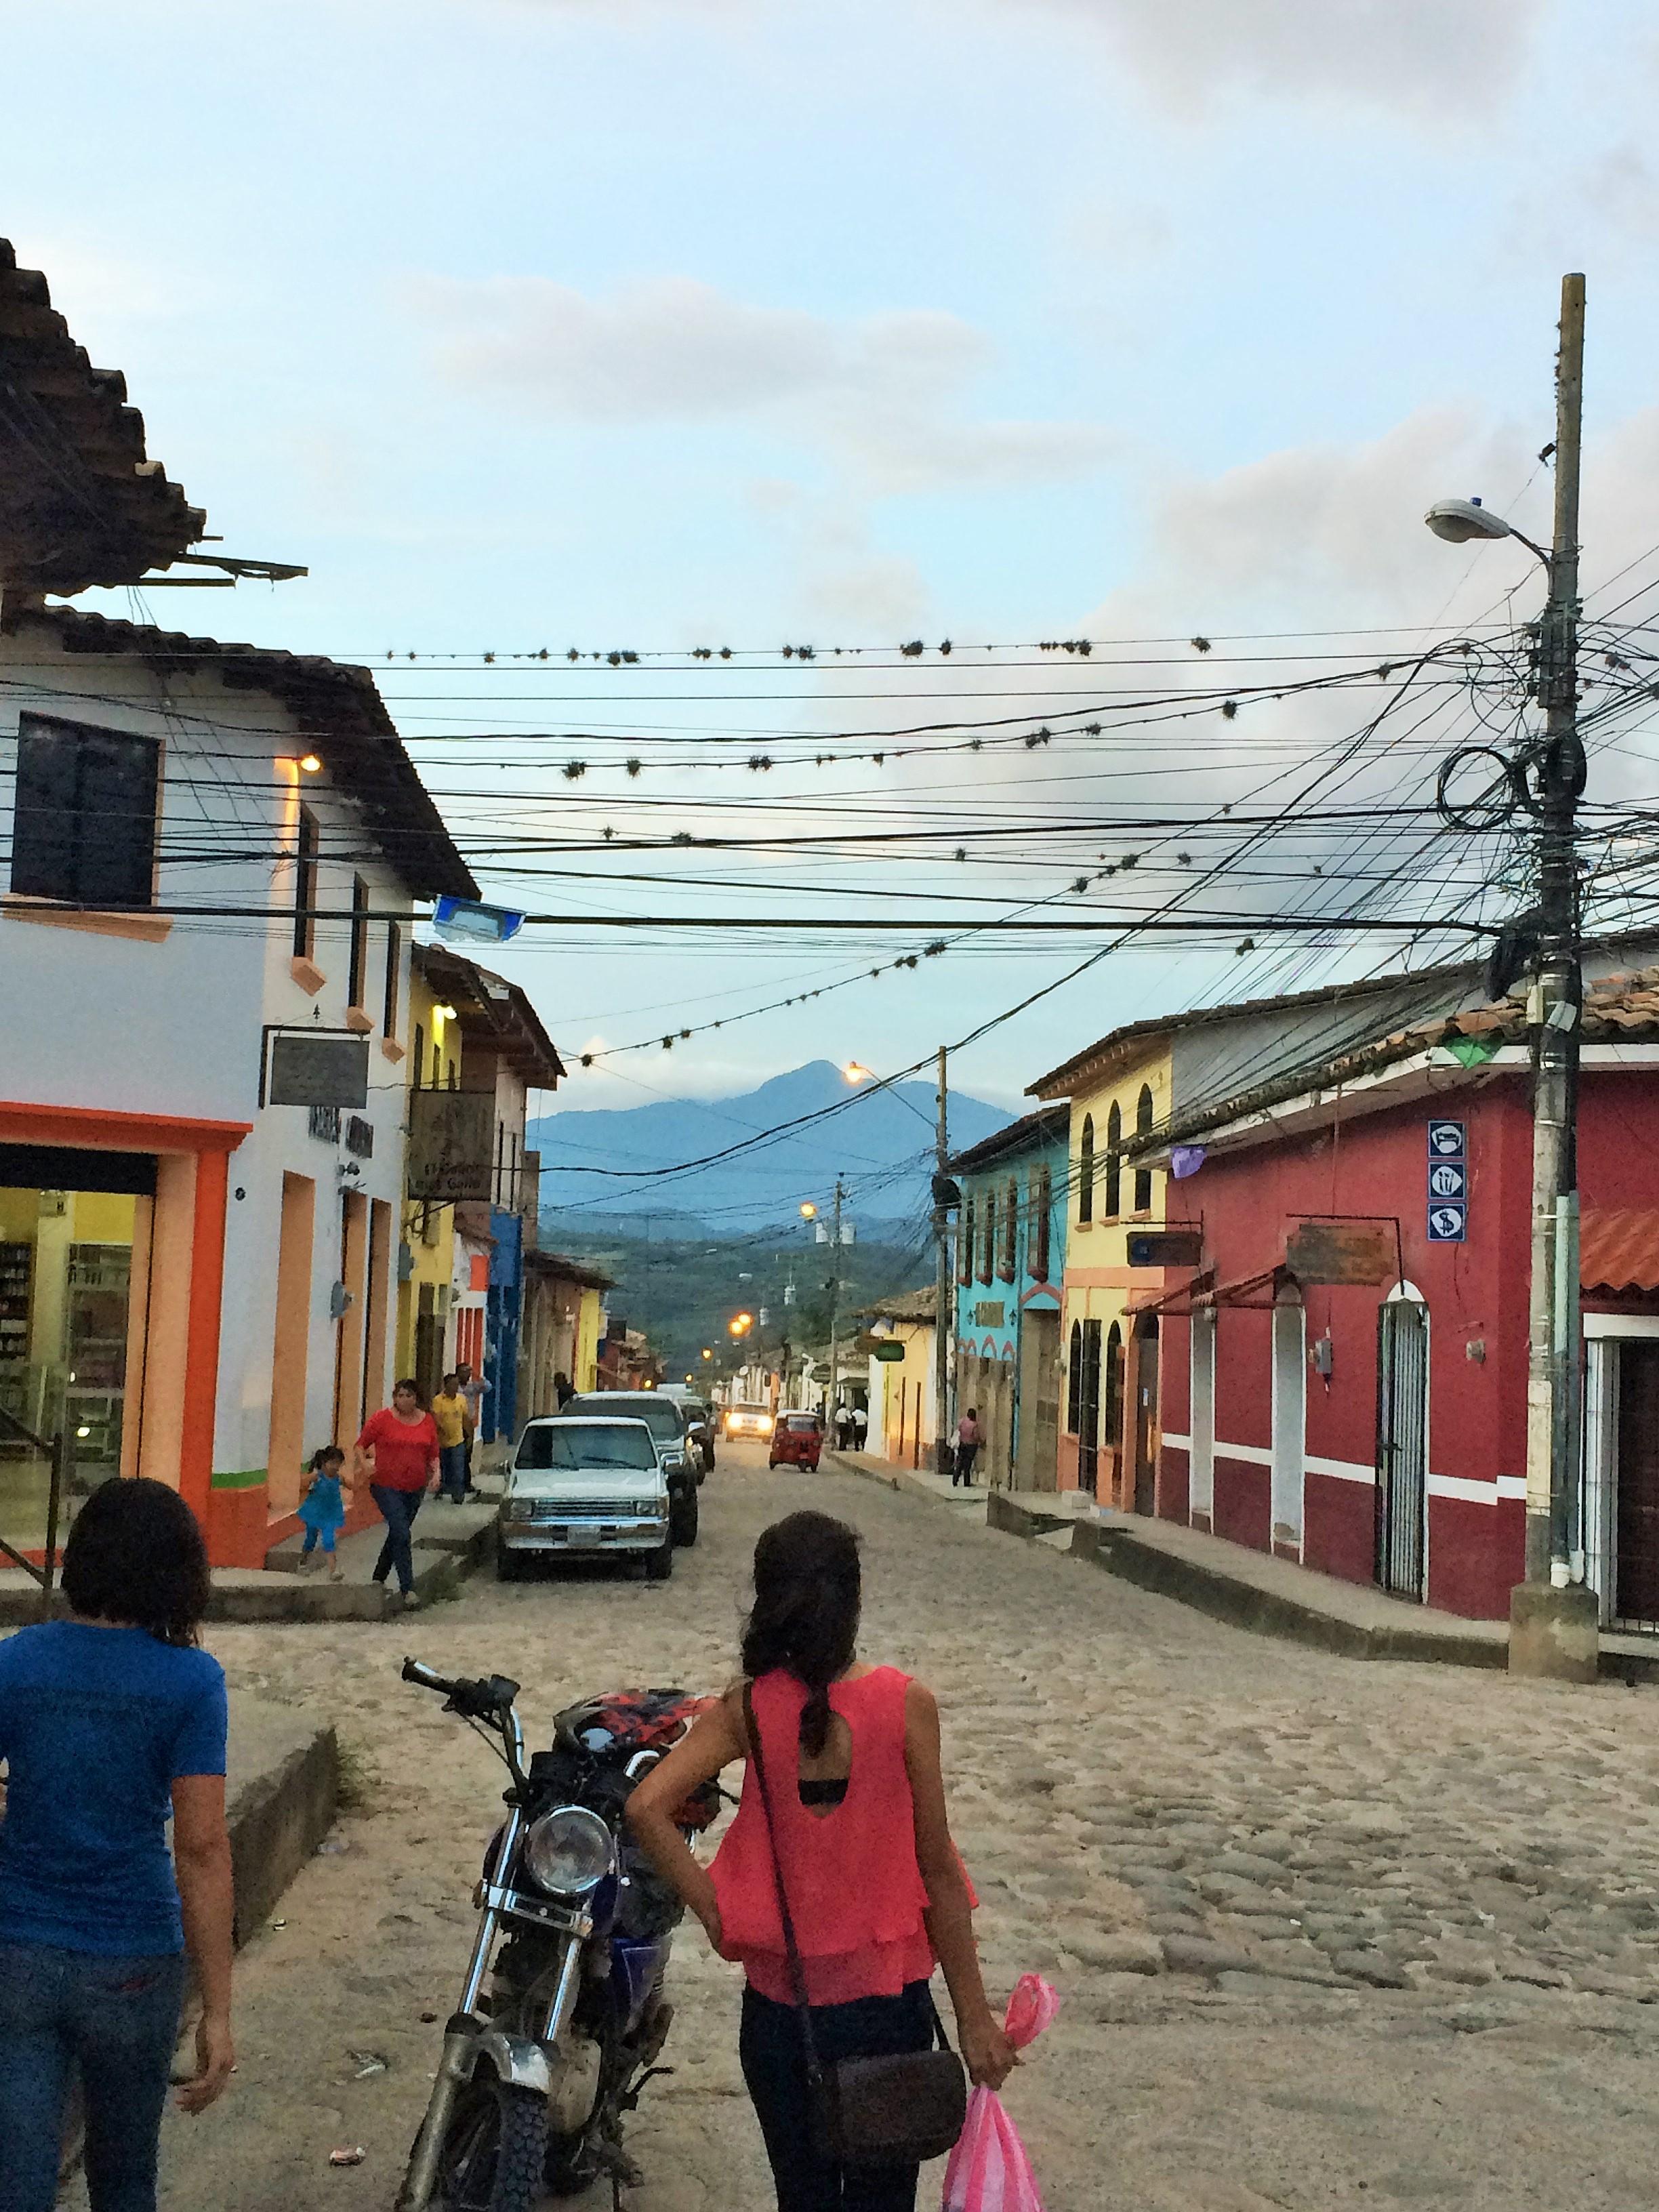 A view of the city of Gracias, Lempira.